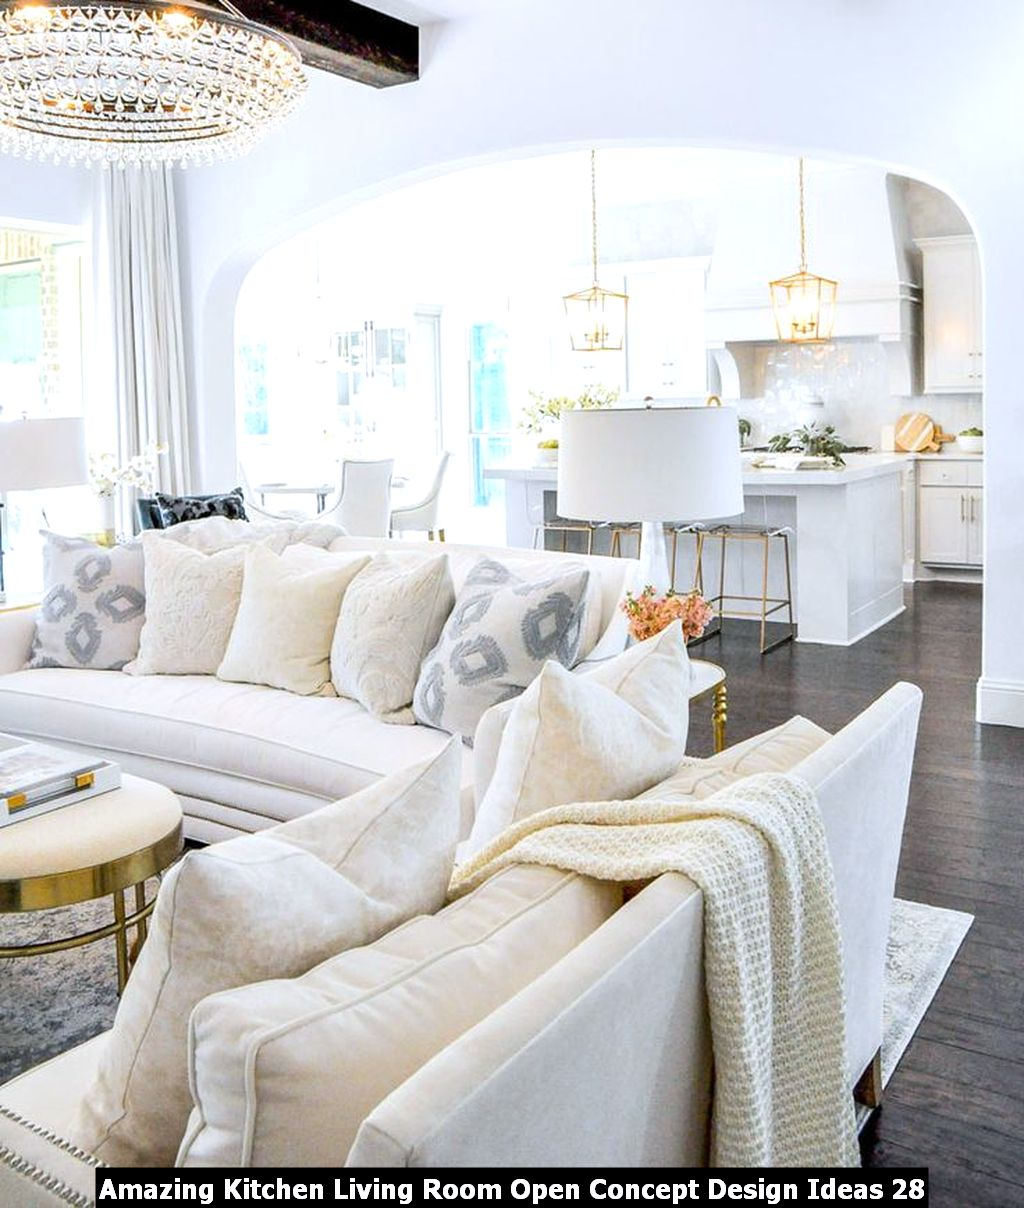 Amazing Kitchen Living Room Open Concept Design Ideas 28